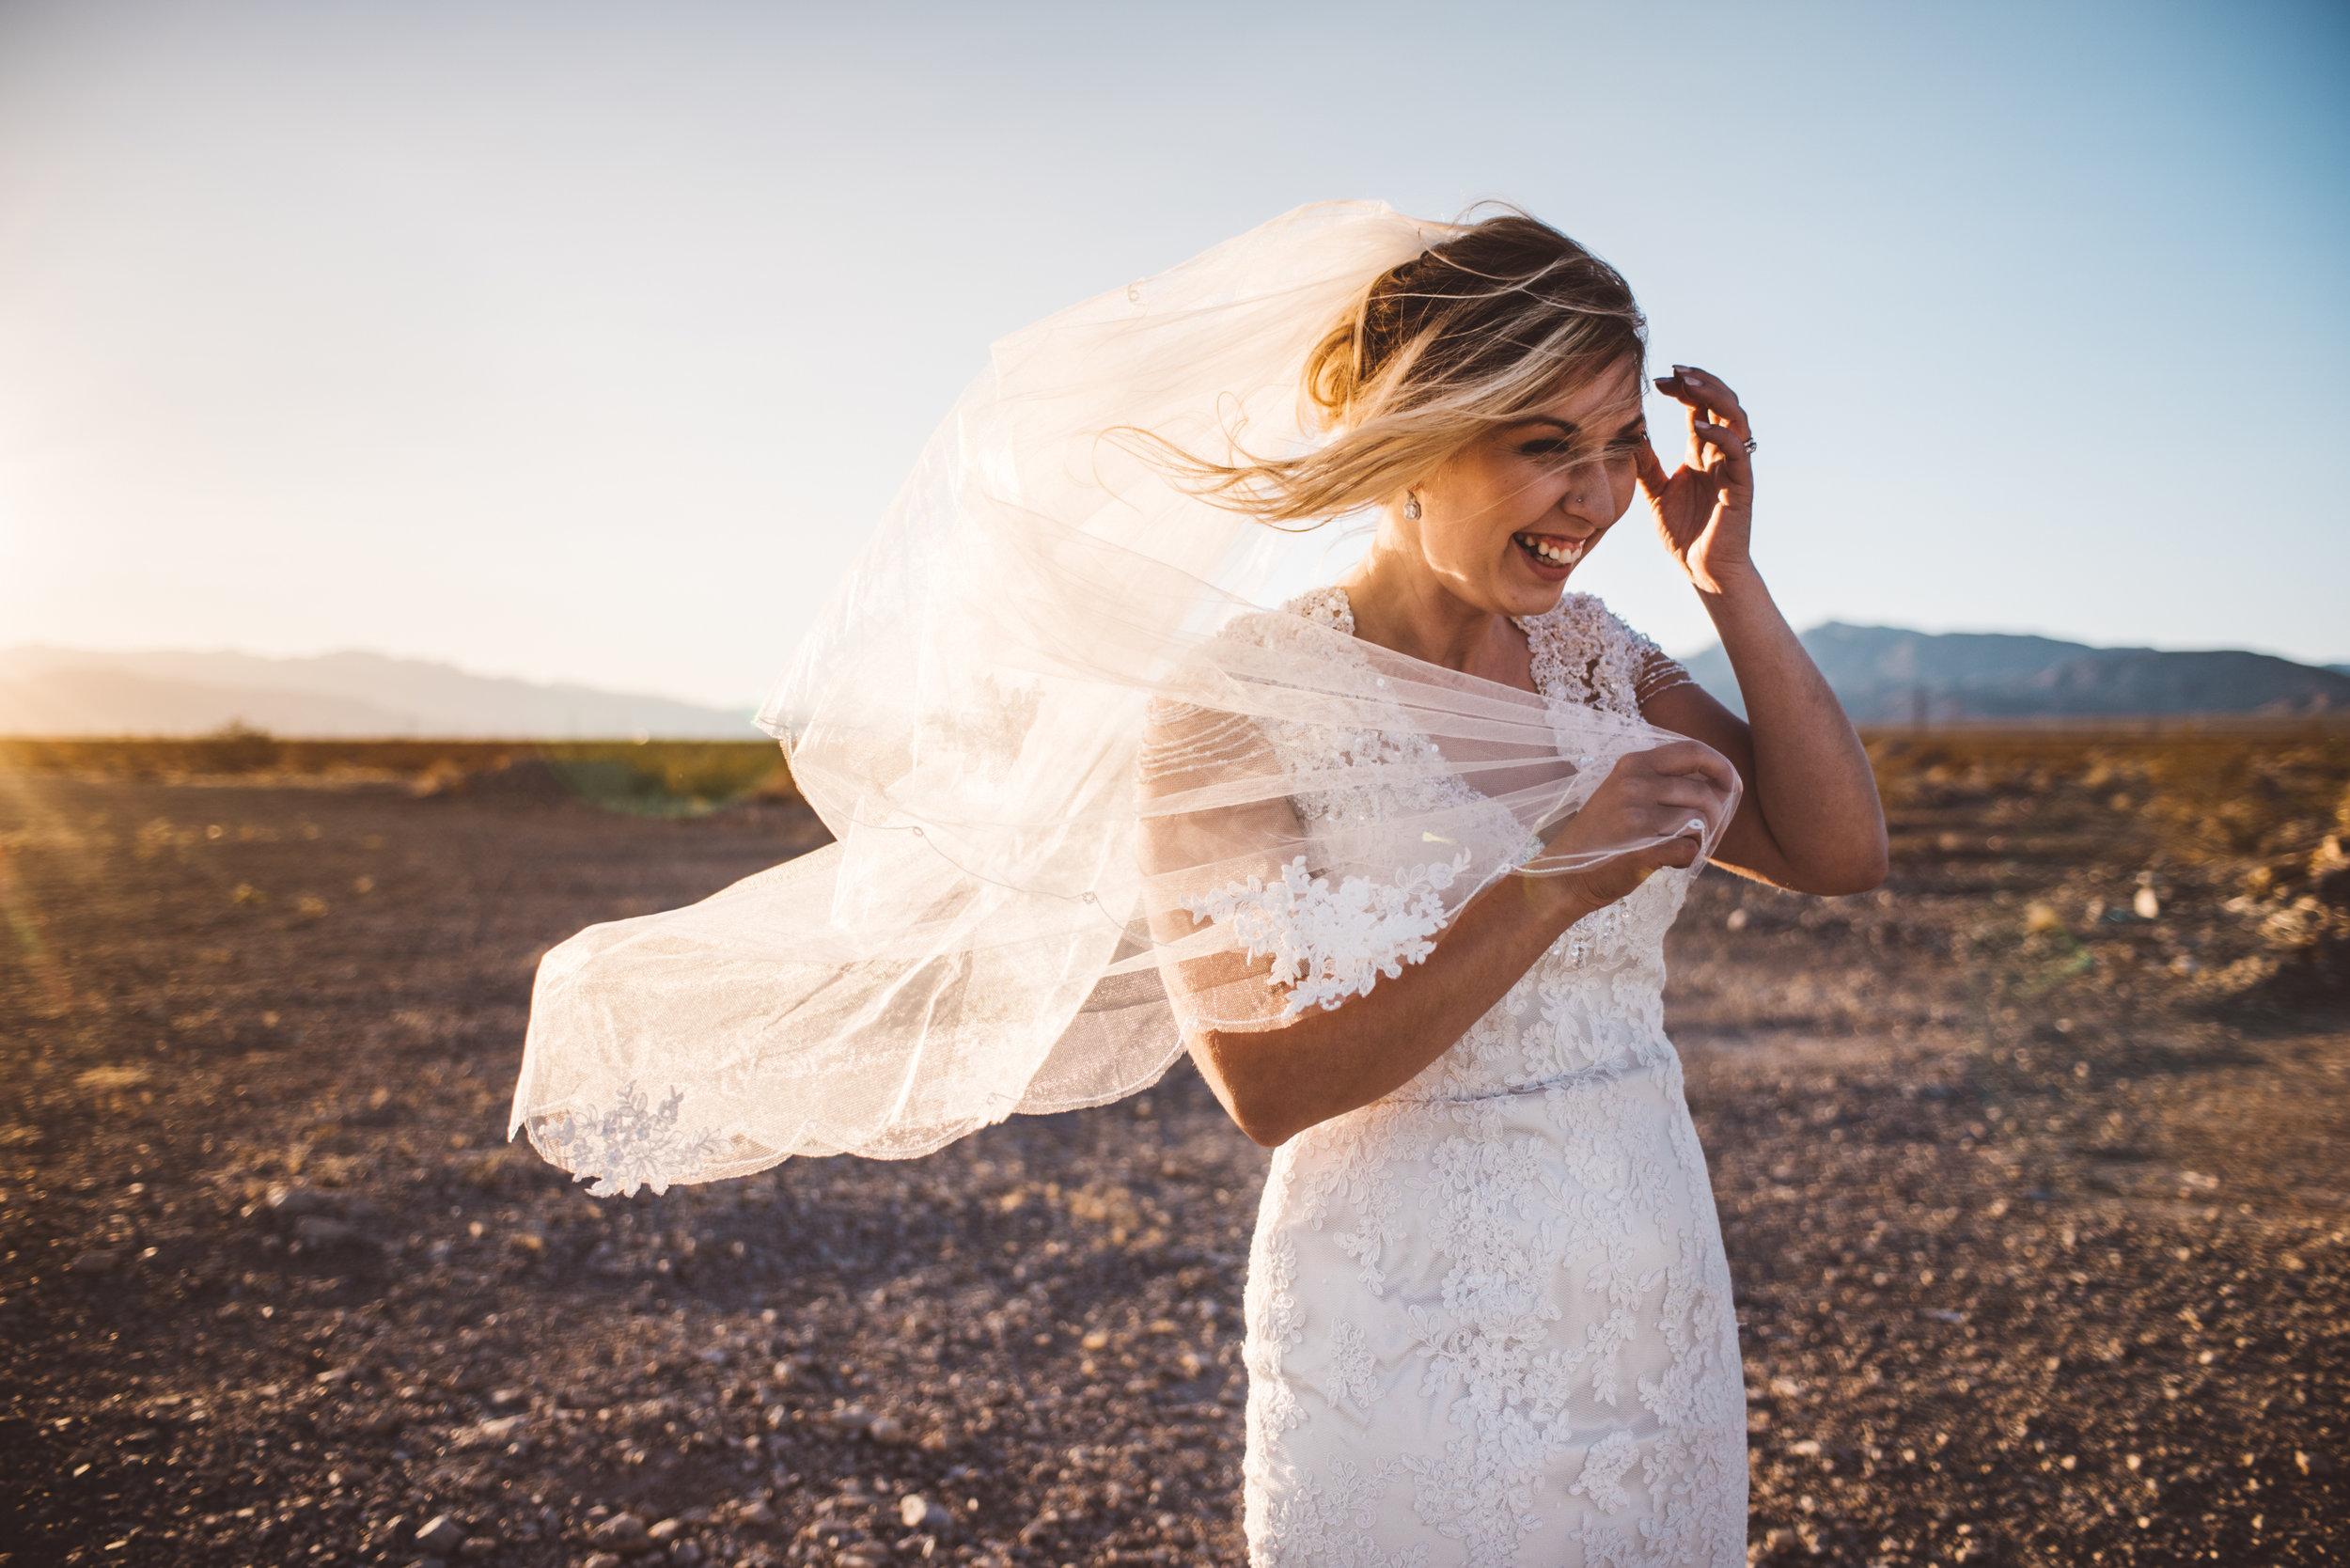 Las Vegas Elopement Photographer Ashley Marie Myers Rock'n Roll Bride-173.jpg